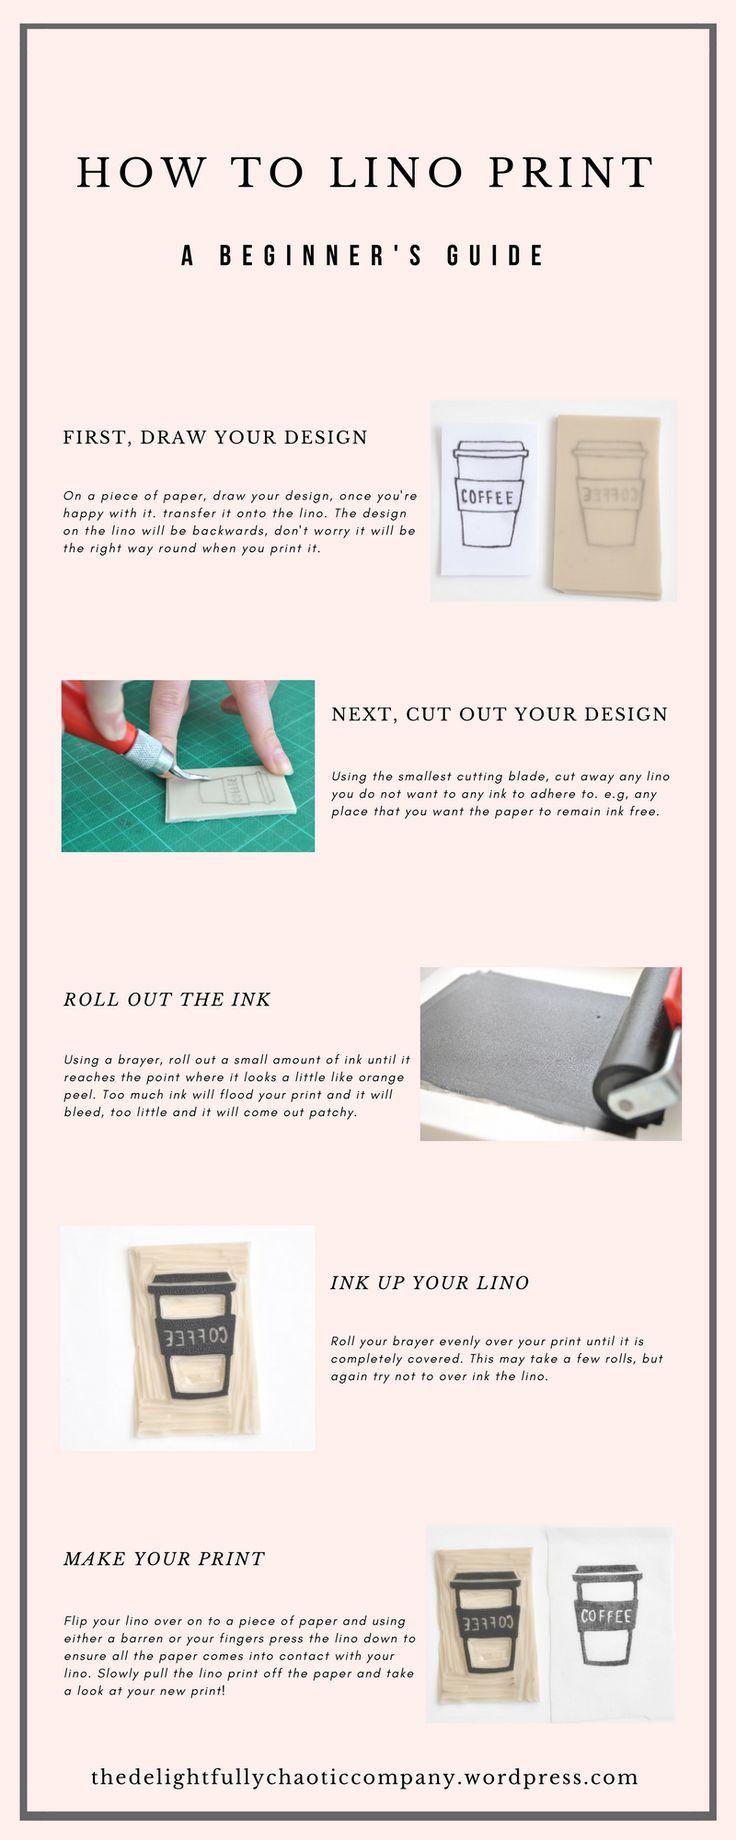 How To Lino Print | Block Printing | Tutorial | How to | Learn to lino cut | Learn to block print | Delightfully Chaotic Company | Wordpress Blog